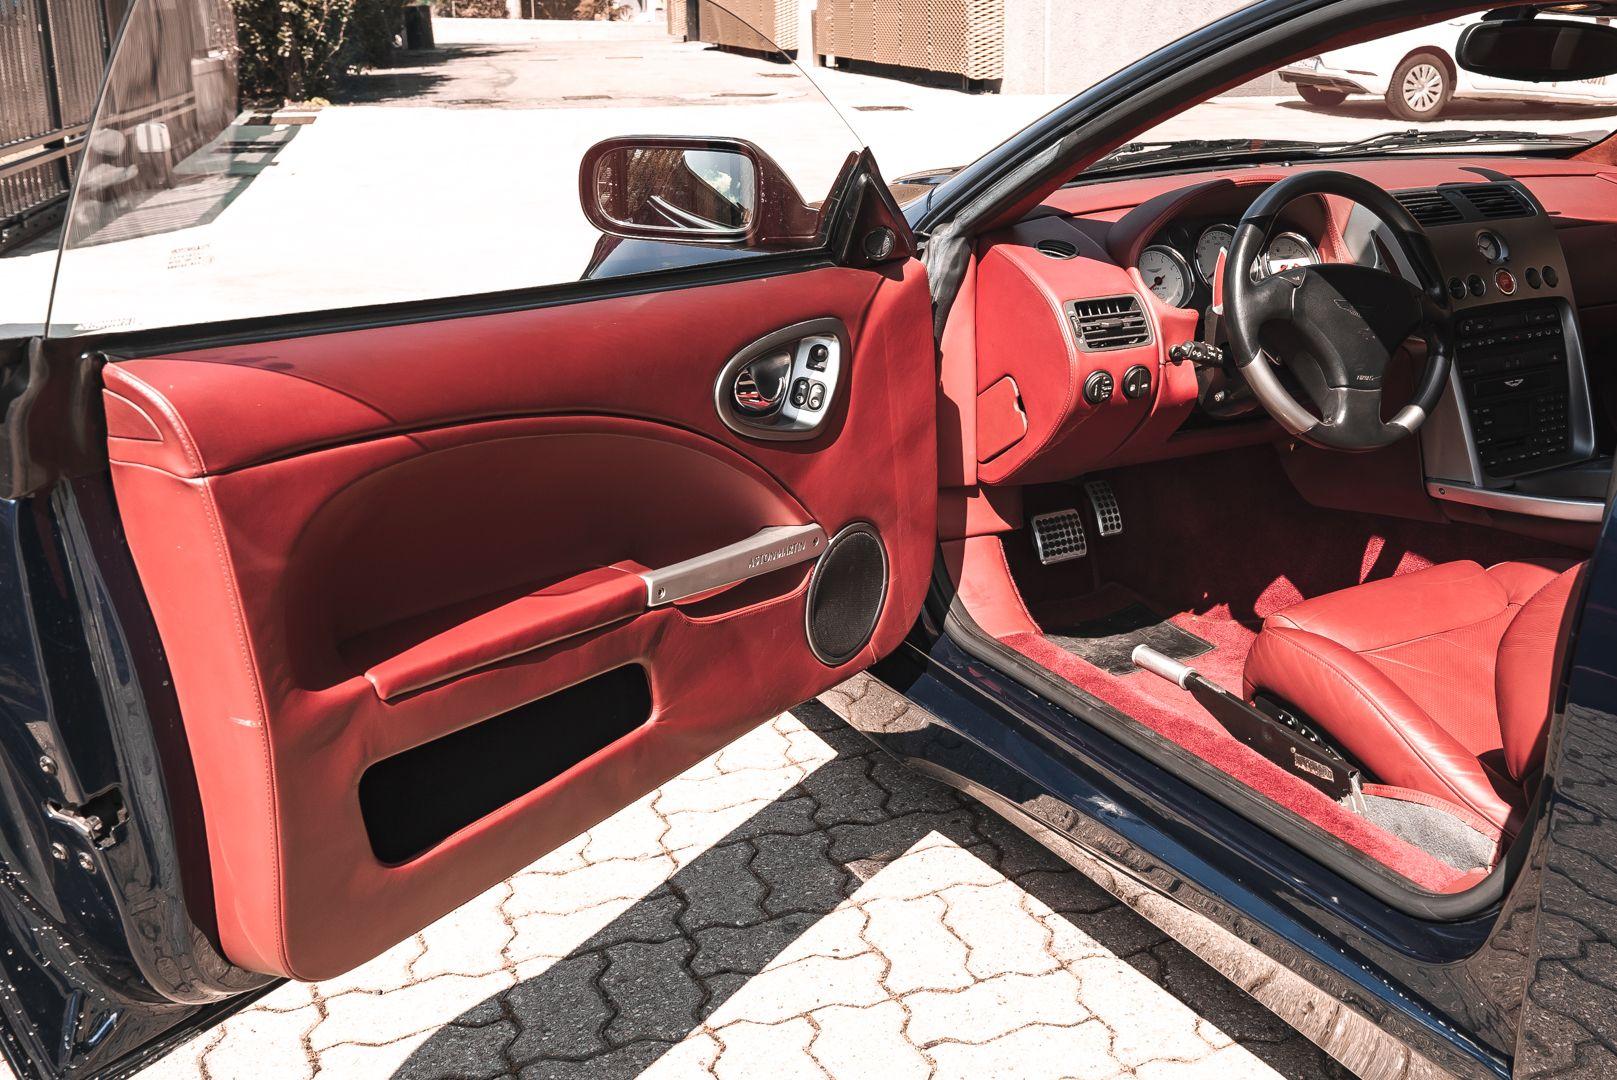 2001 Aston Martin V12 Vanquish 67932